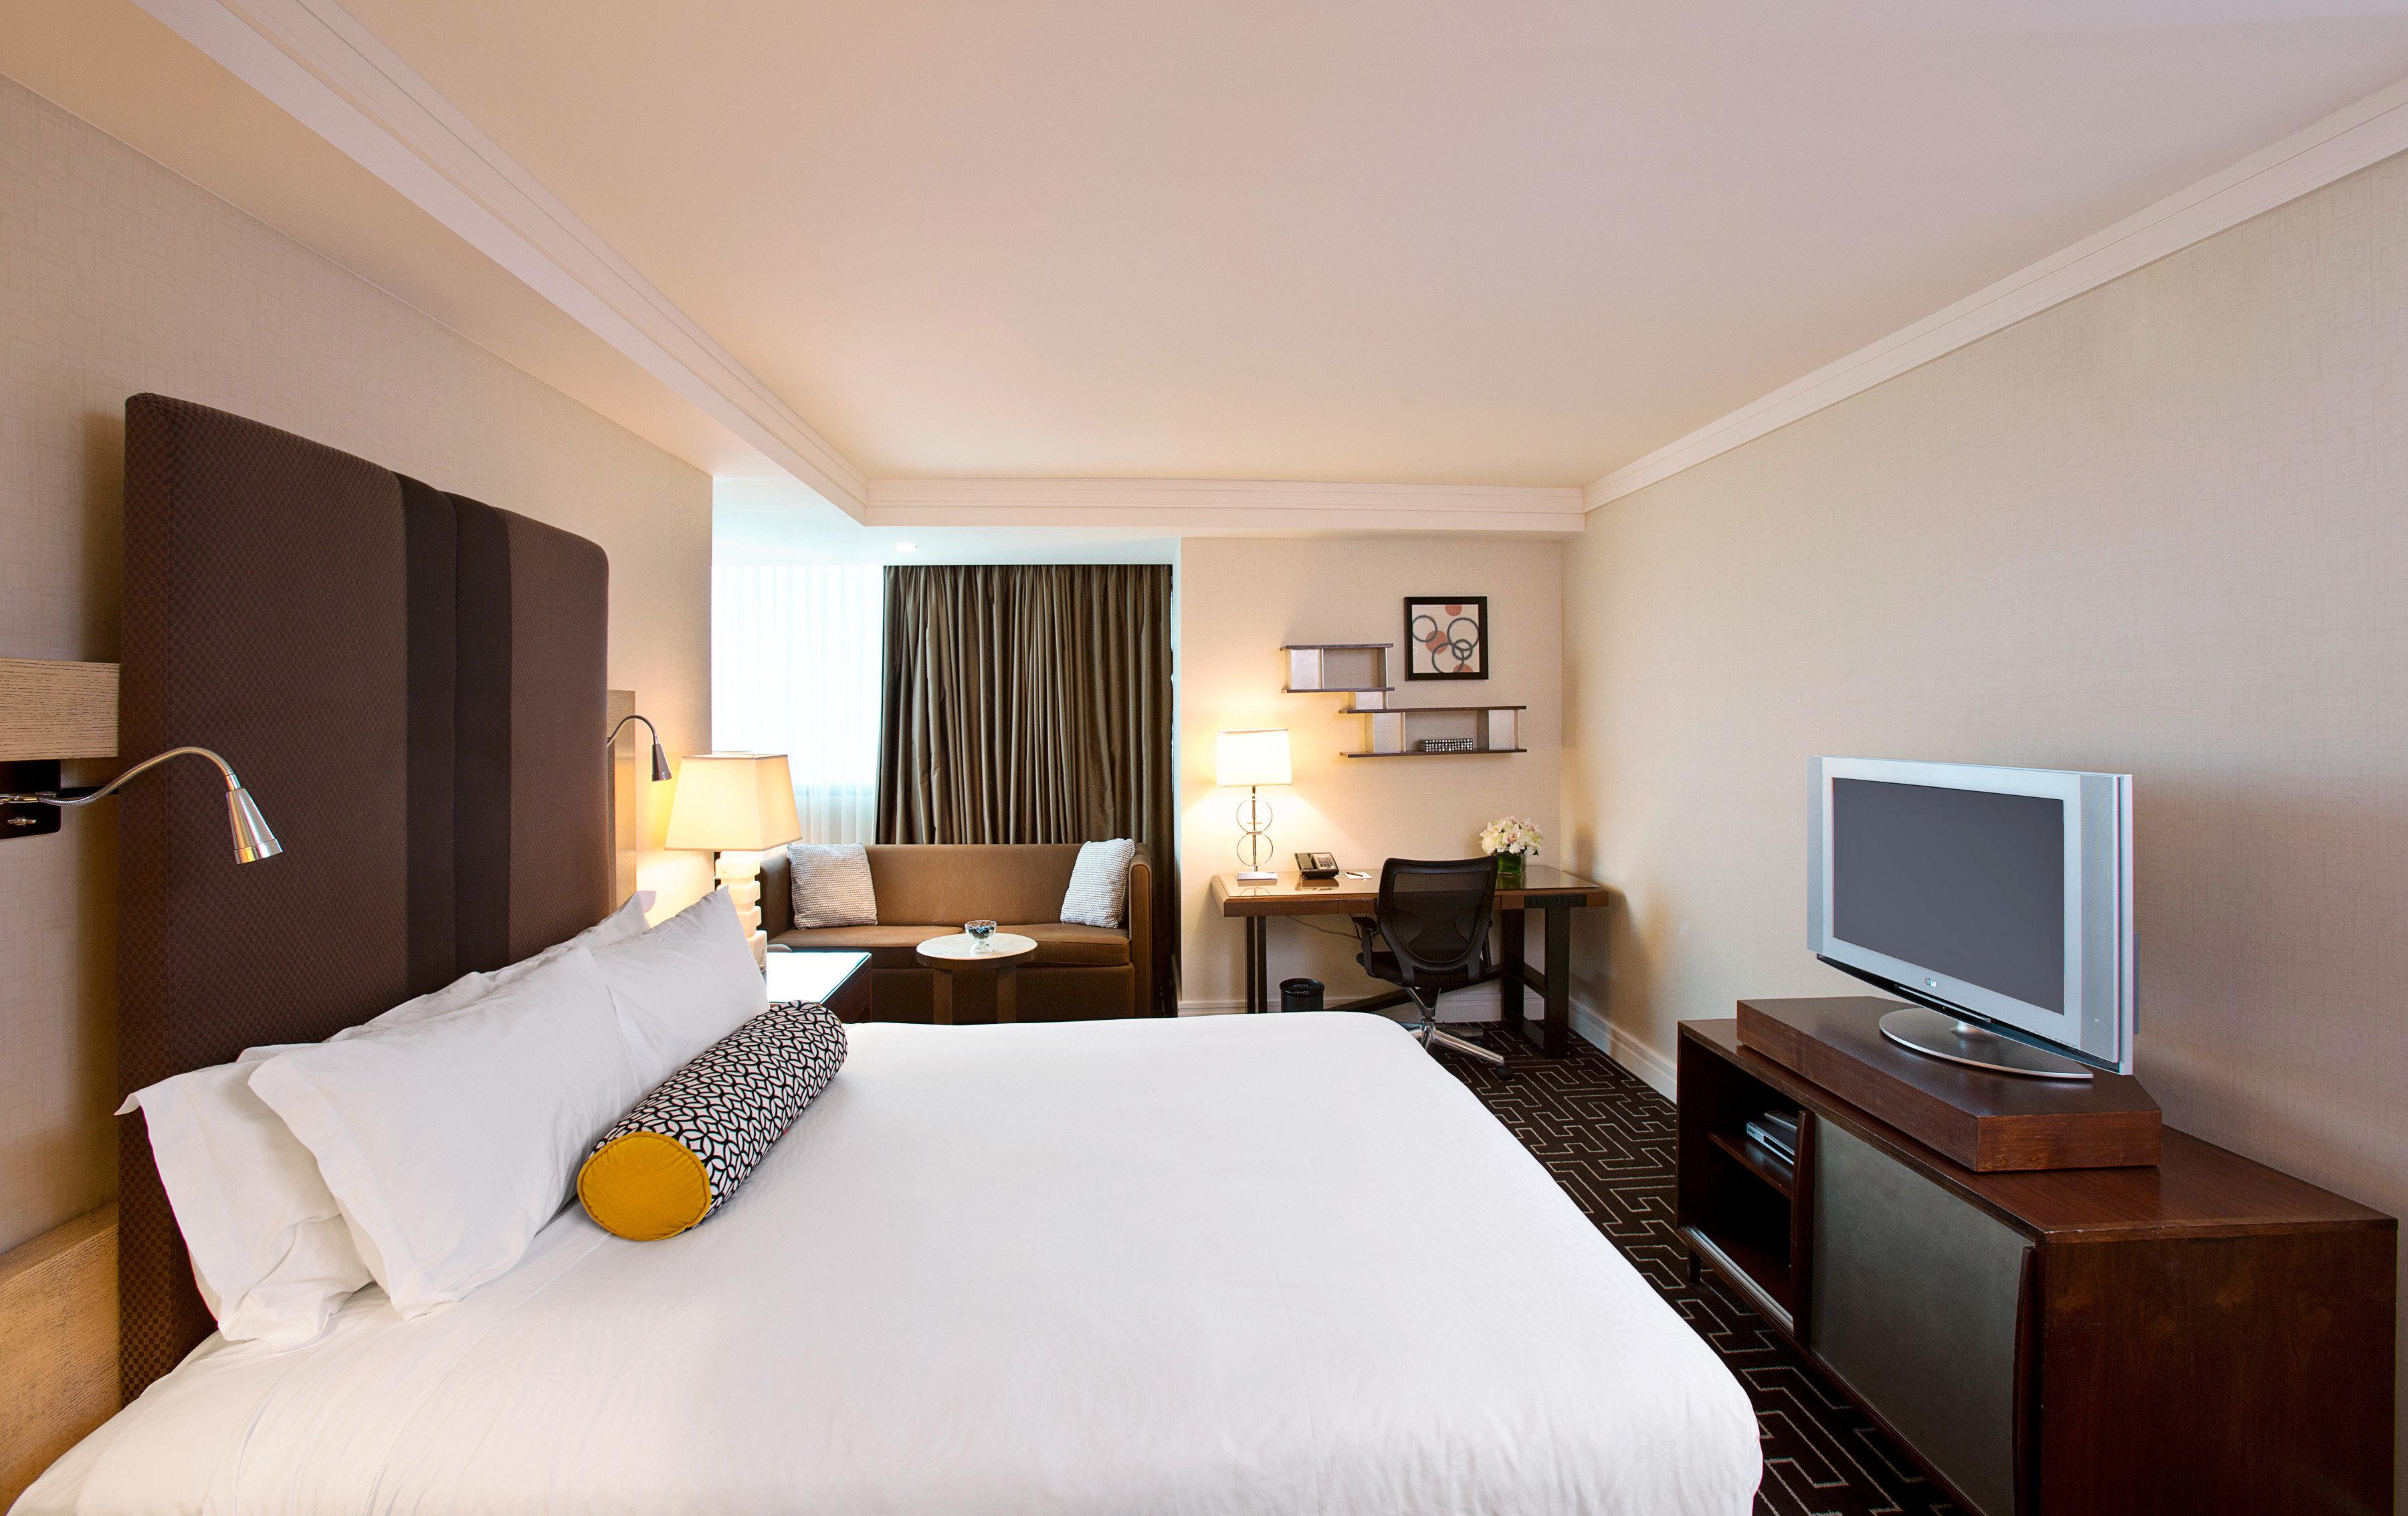 Bedroom City sofa property Suite cottage flat